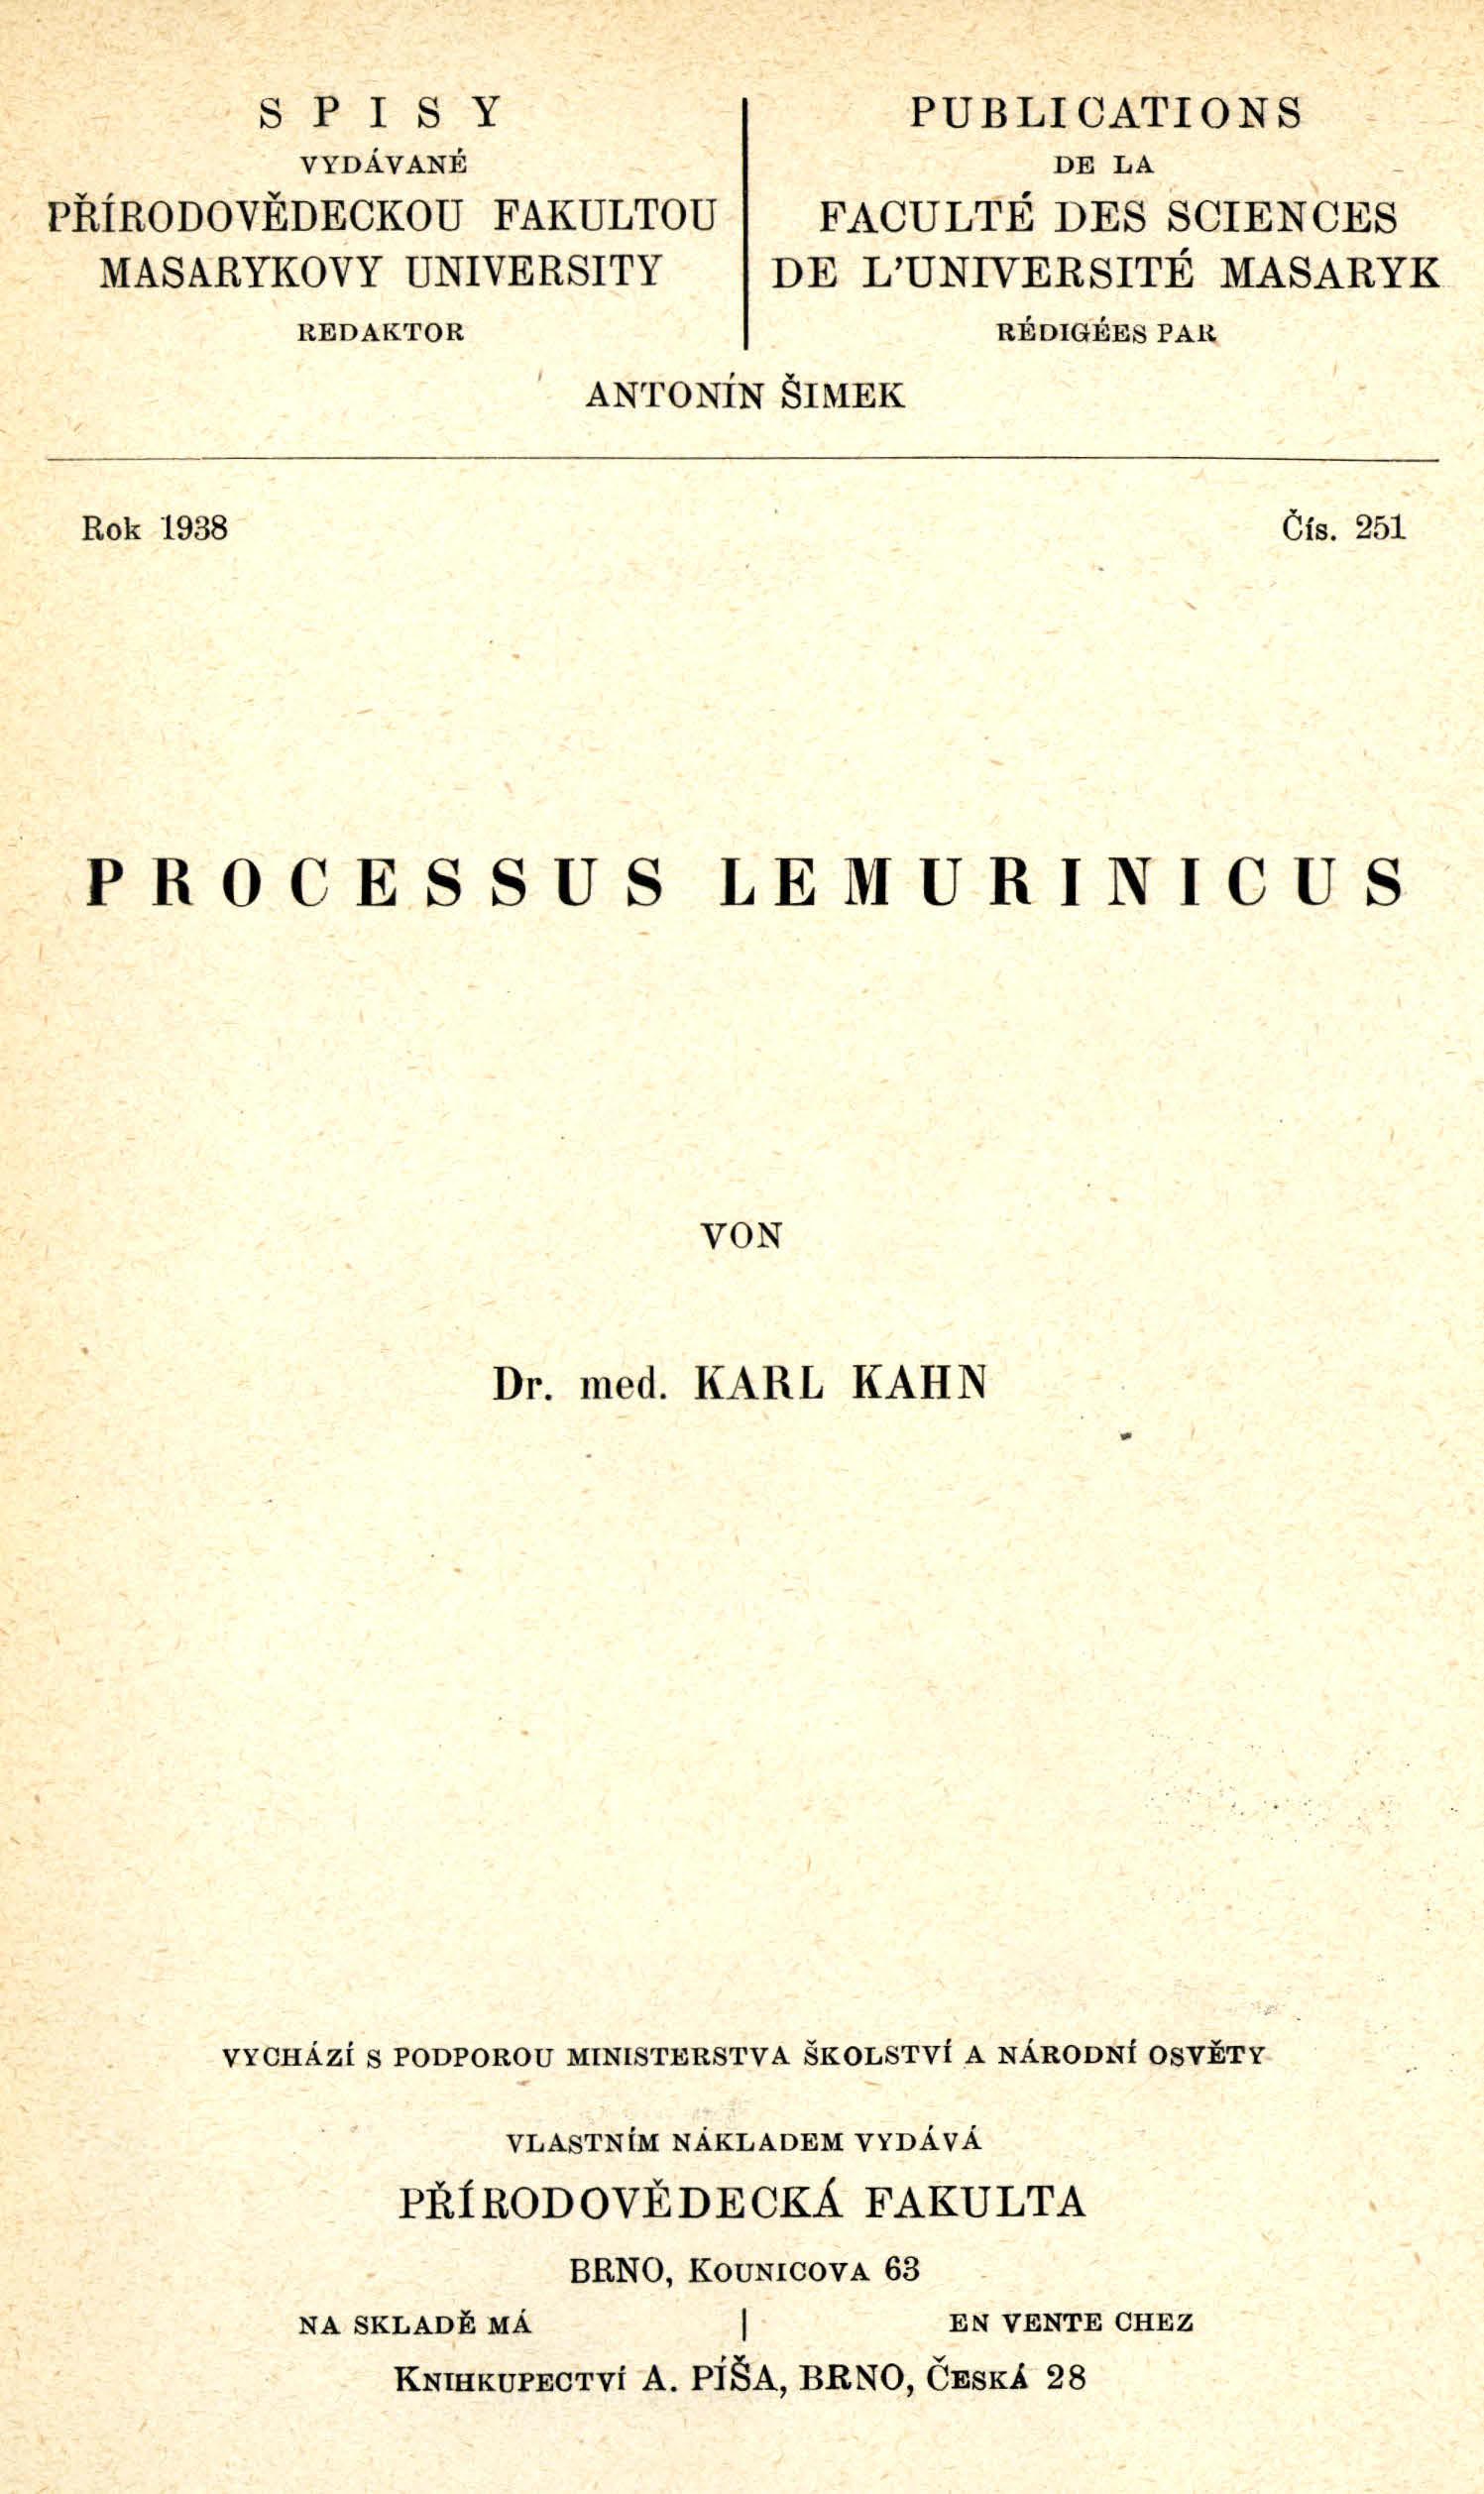 Obálka pro Processus lemurinicus